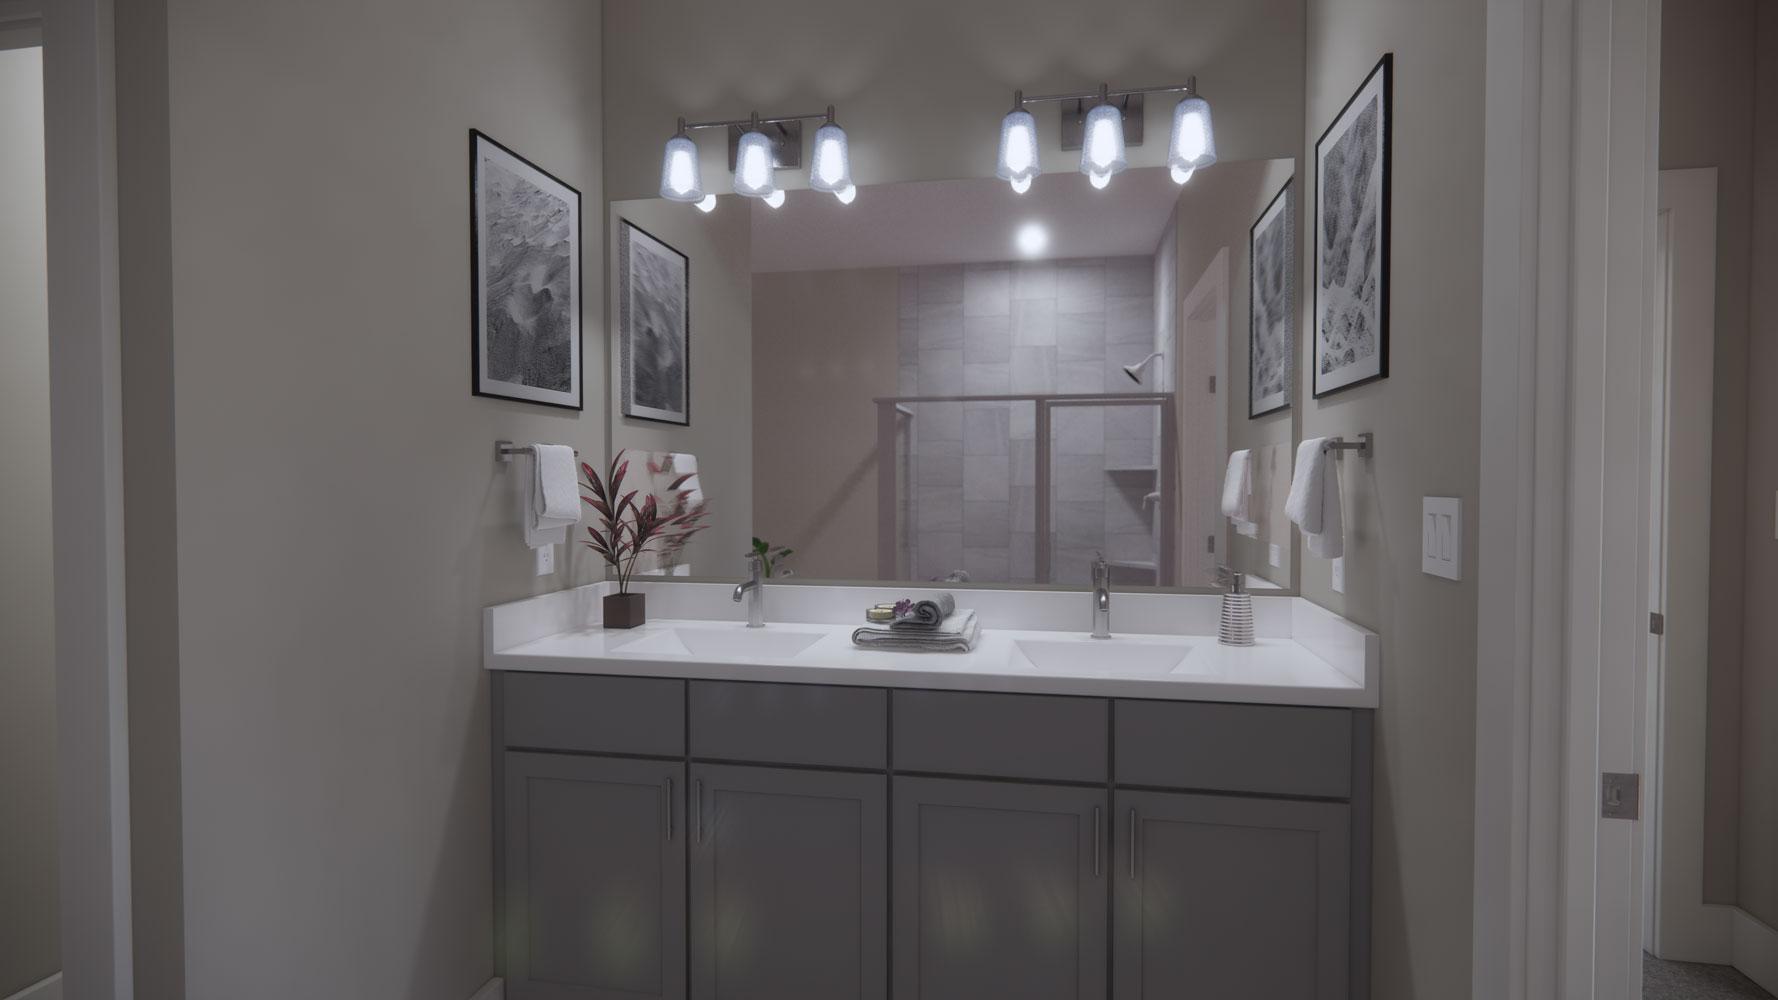 Luxury Bathroom Furnishings at Echelon at Reverchon Bluffs in Dallas, Texas